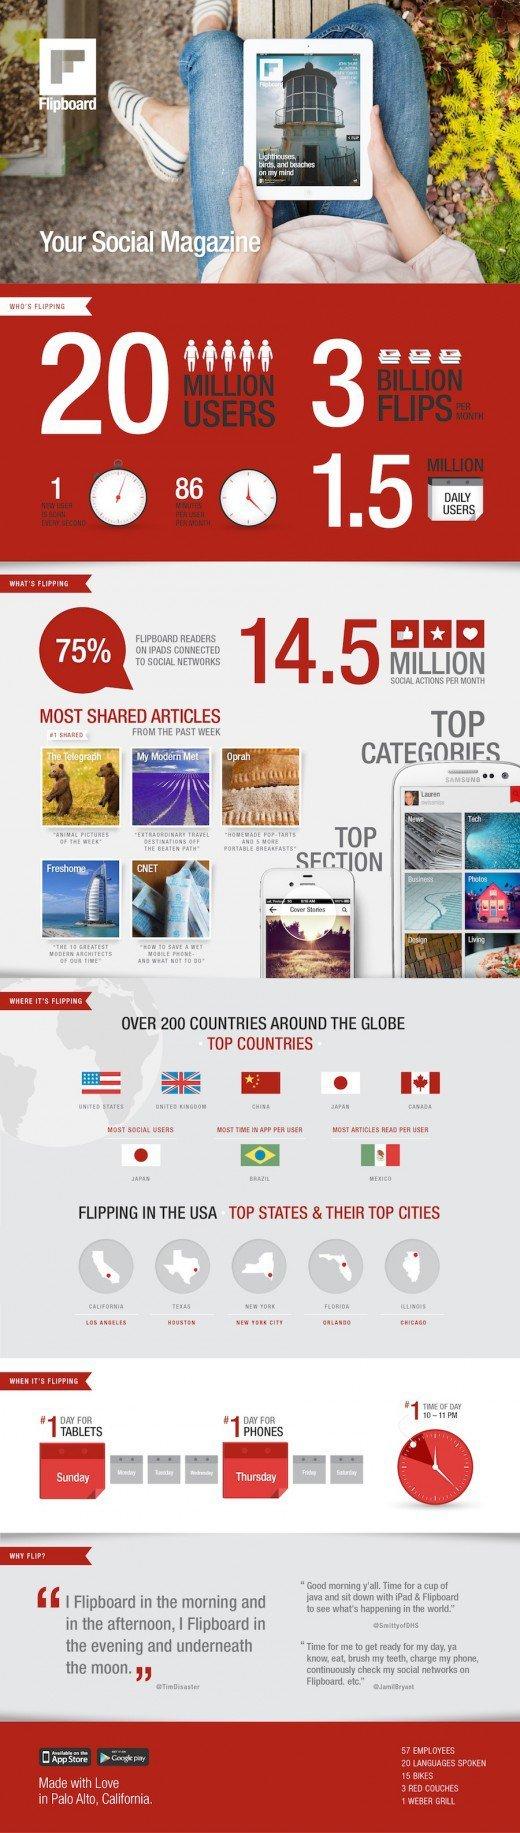 Flipboard-infographic